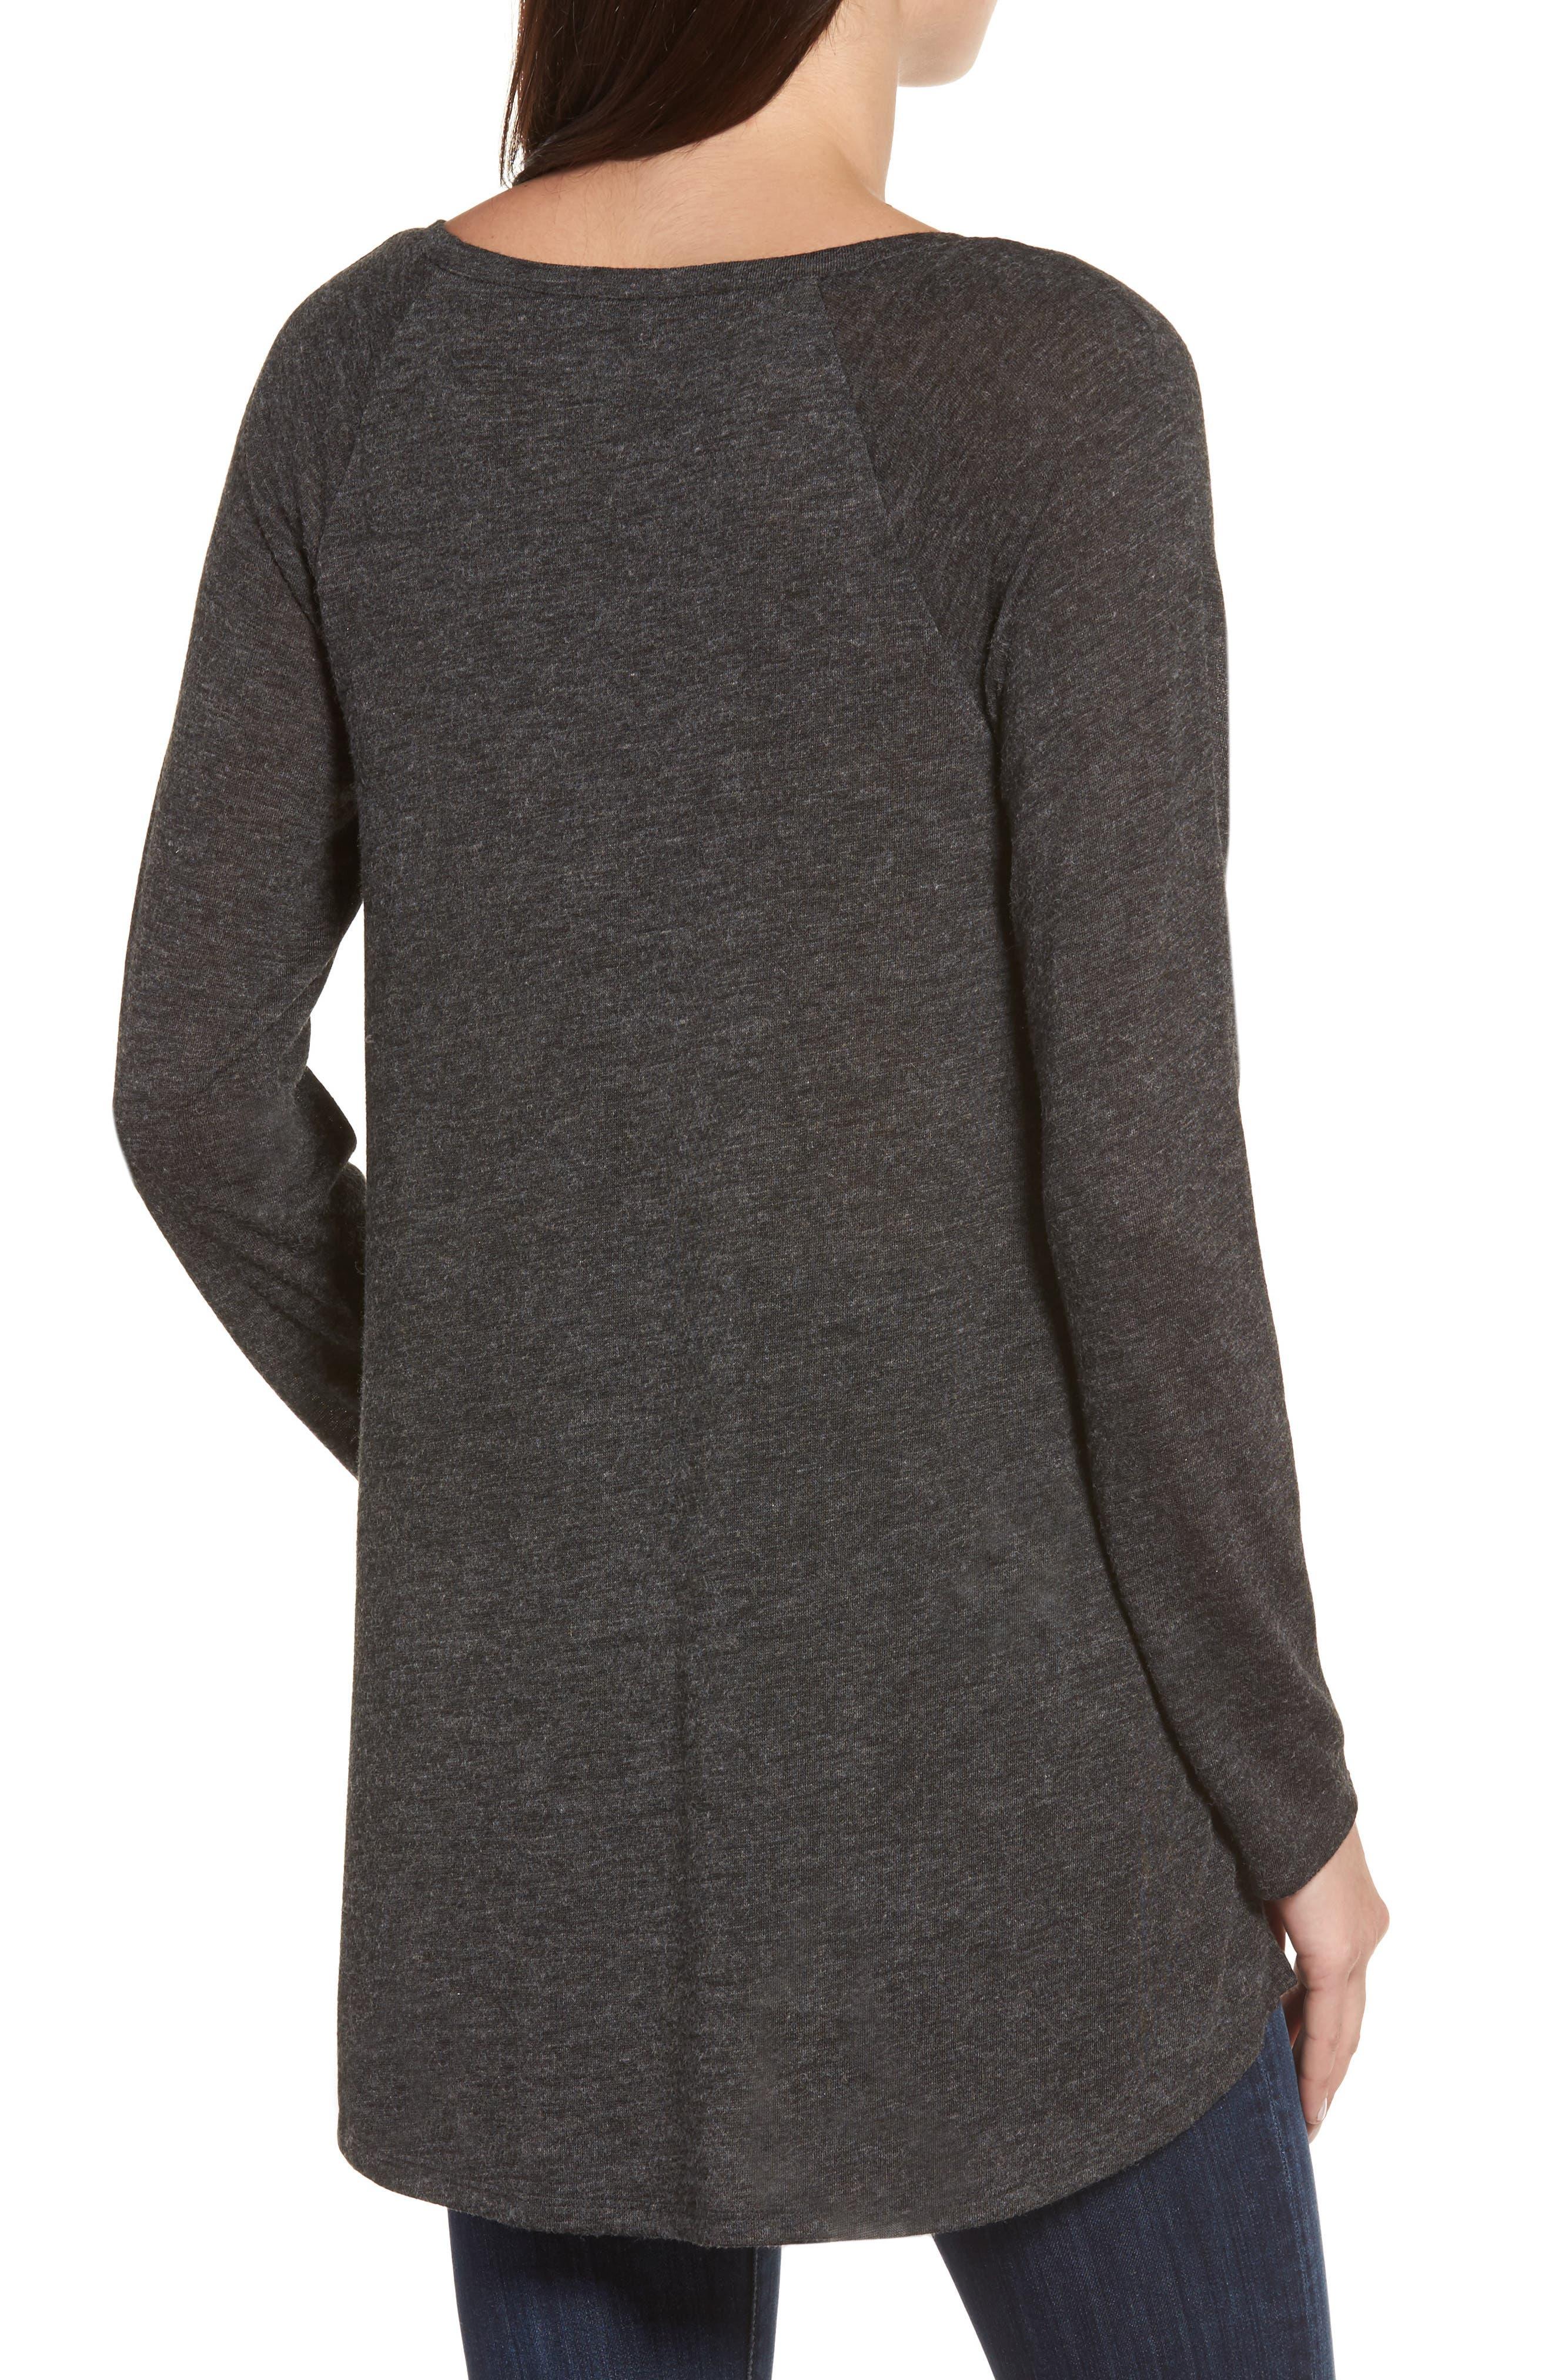 High/Low Tunic Sweatshirt,                             Alternate thumbnail 2, color,                             001